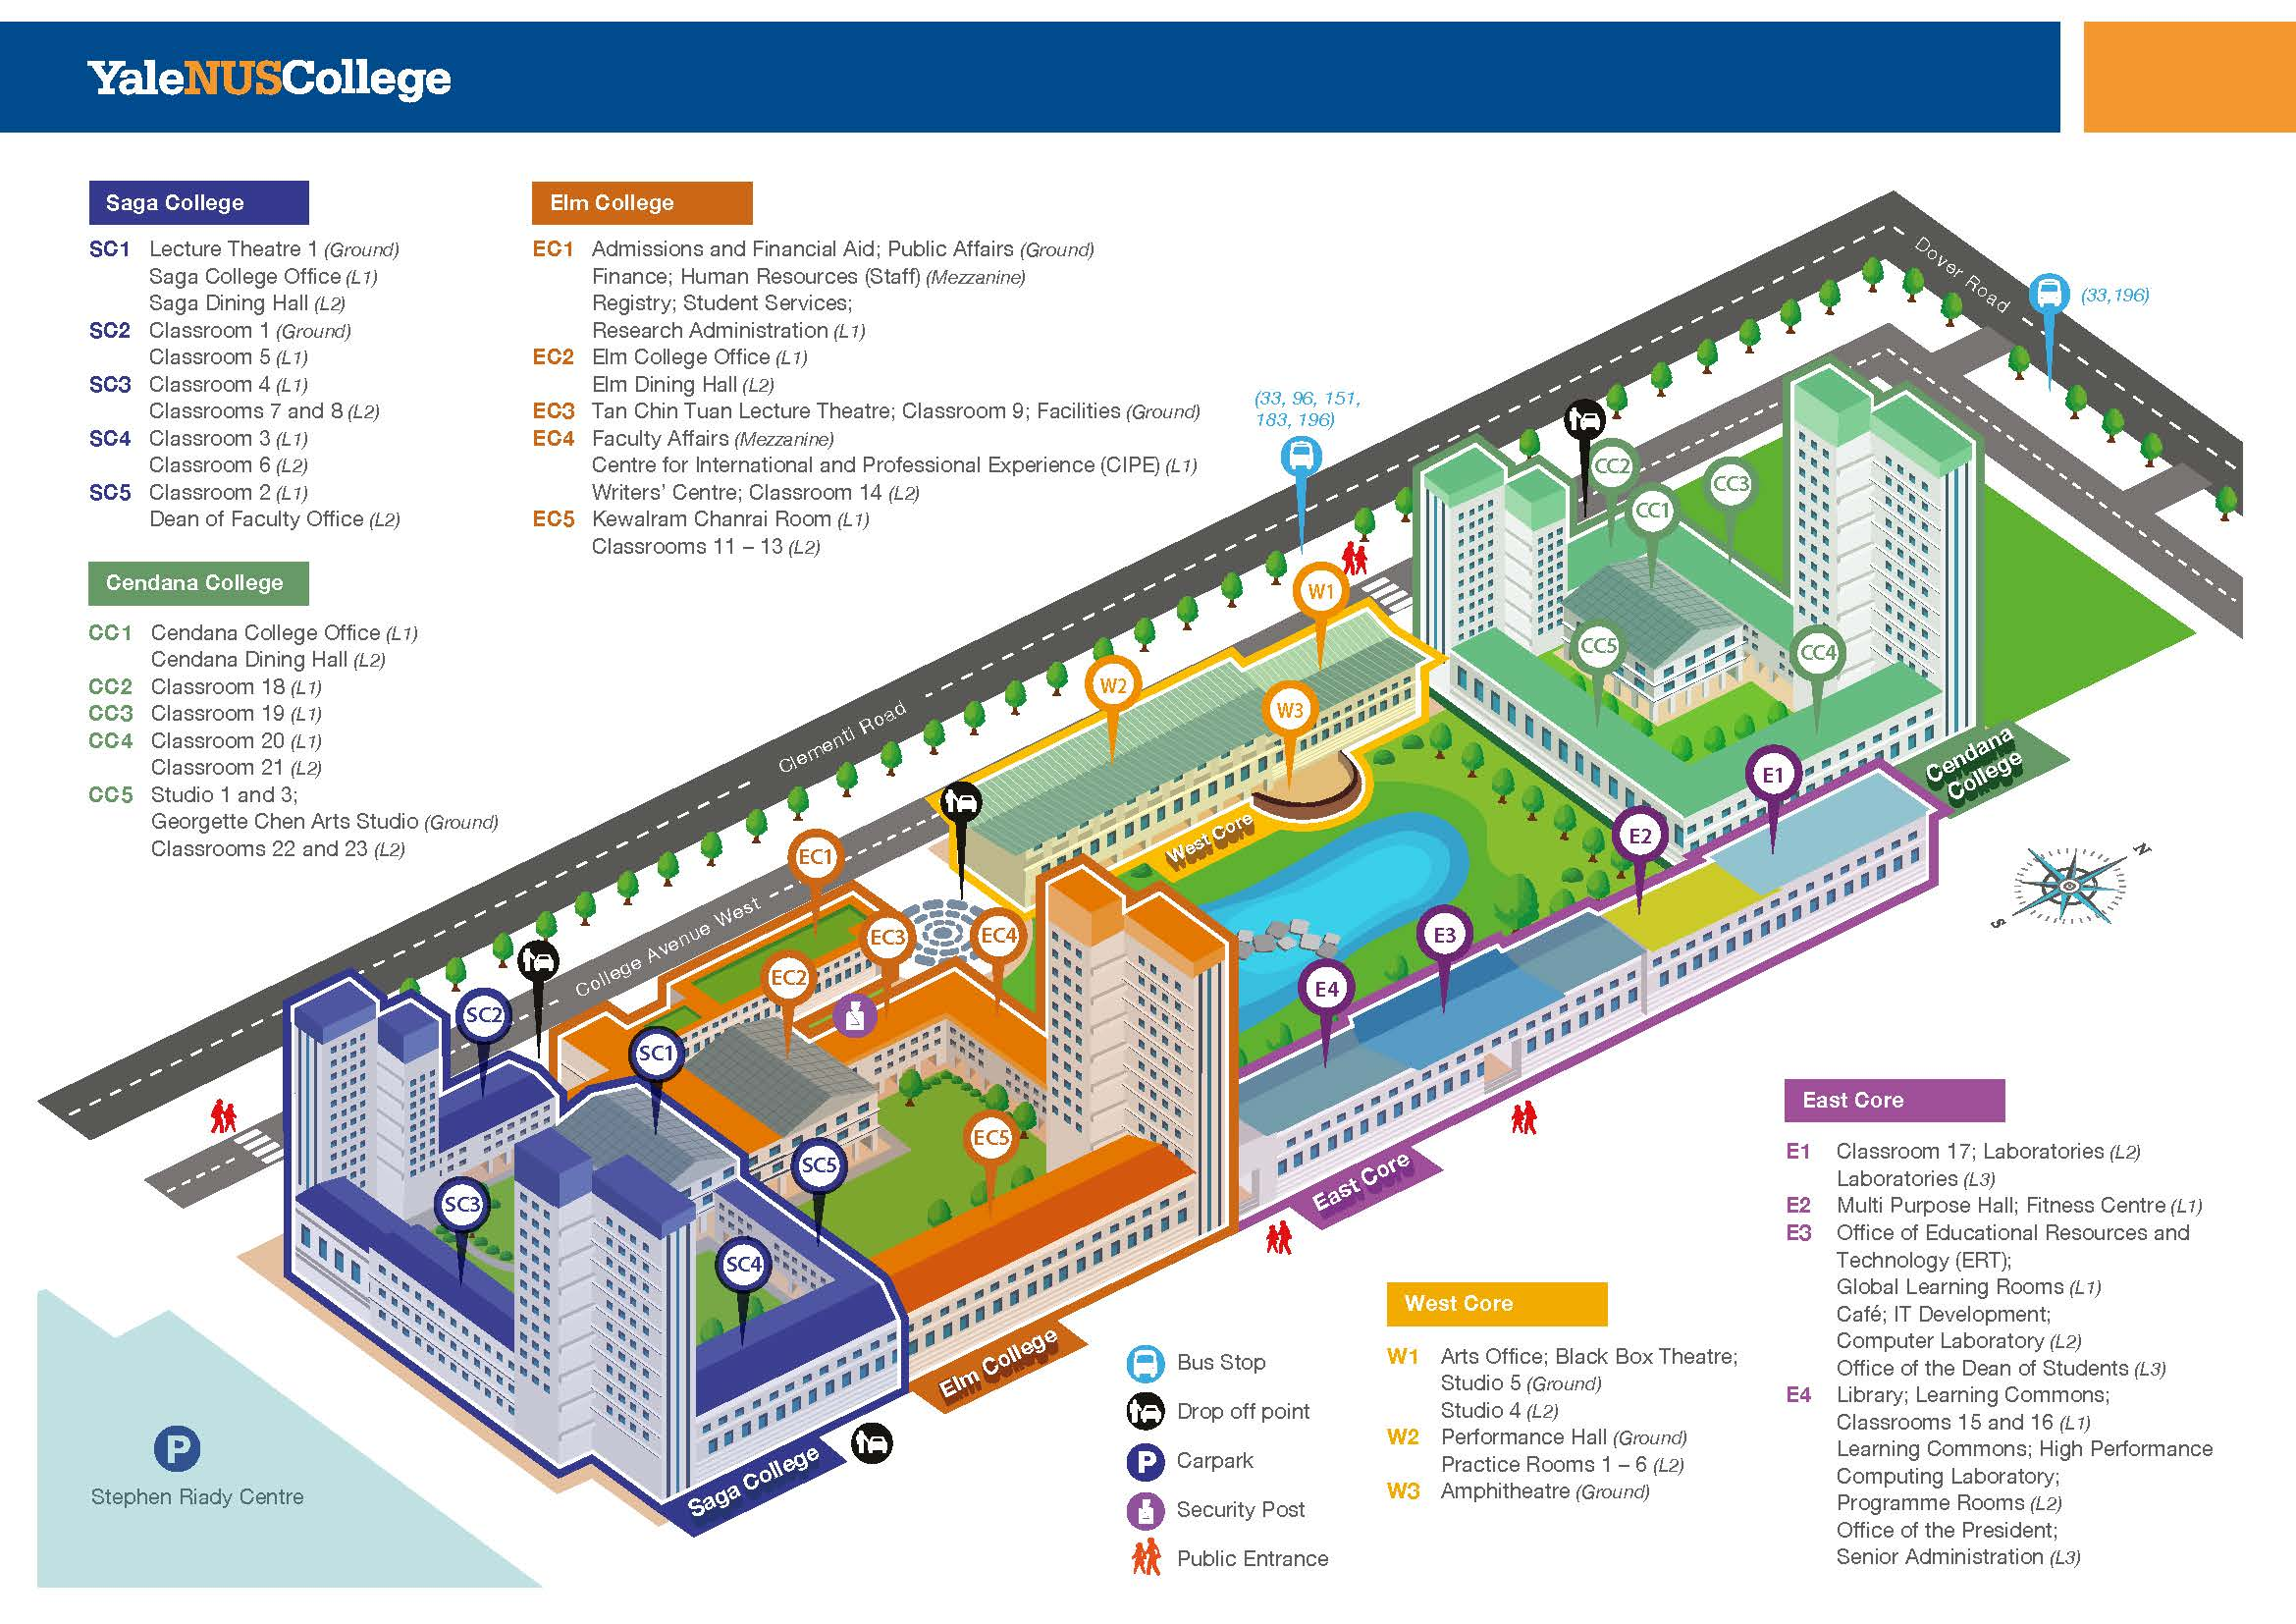 Campus map - overhead